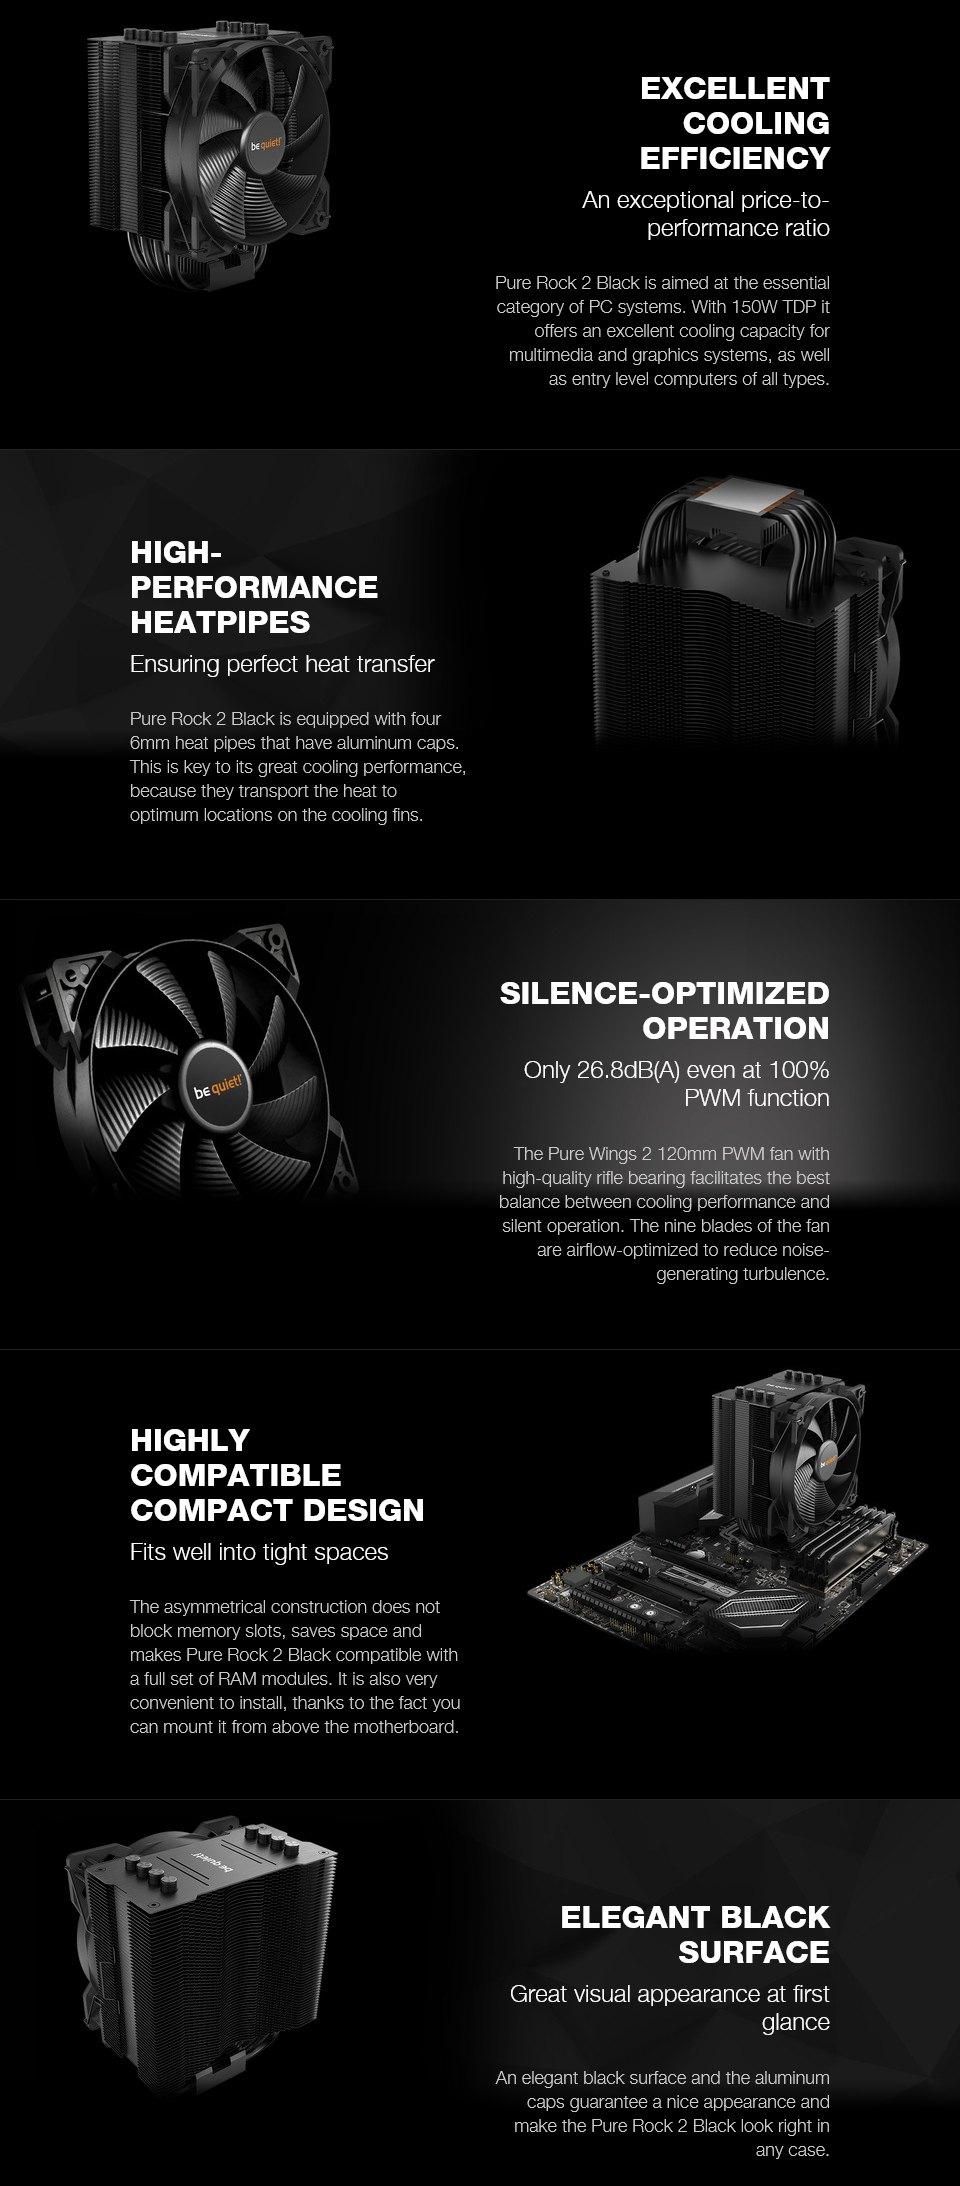 be quiet! Pure Rock 2 CPU Cooler Black features